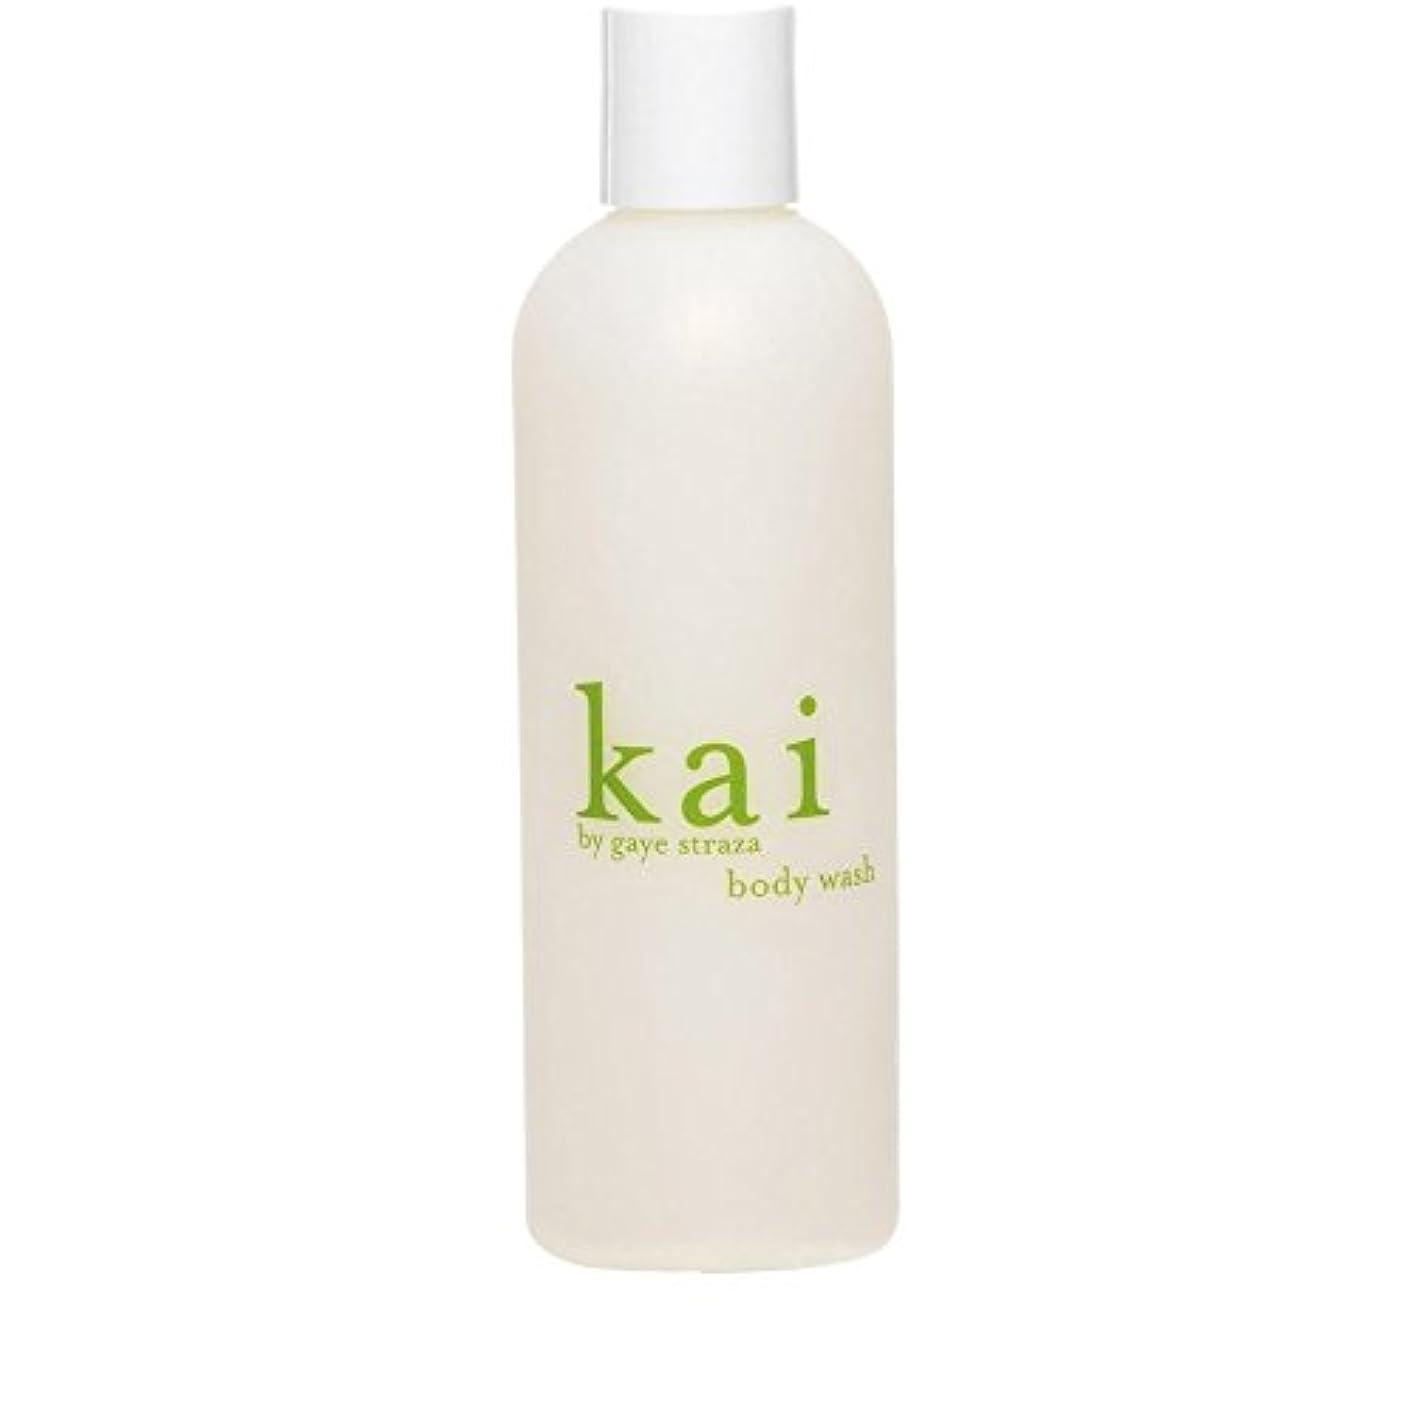 Kai by Gaye Straza Kai Body Wash 235ml (Pack of 6) - ゲイ?ストラザ会ボディウォッシュ235ミリリットルによって会 x6 [並行輸入品]